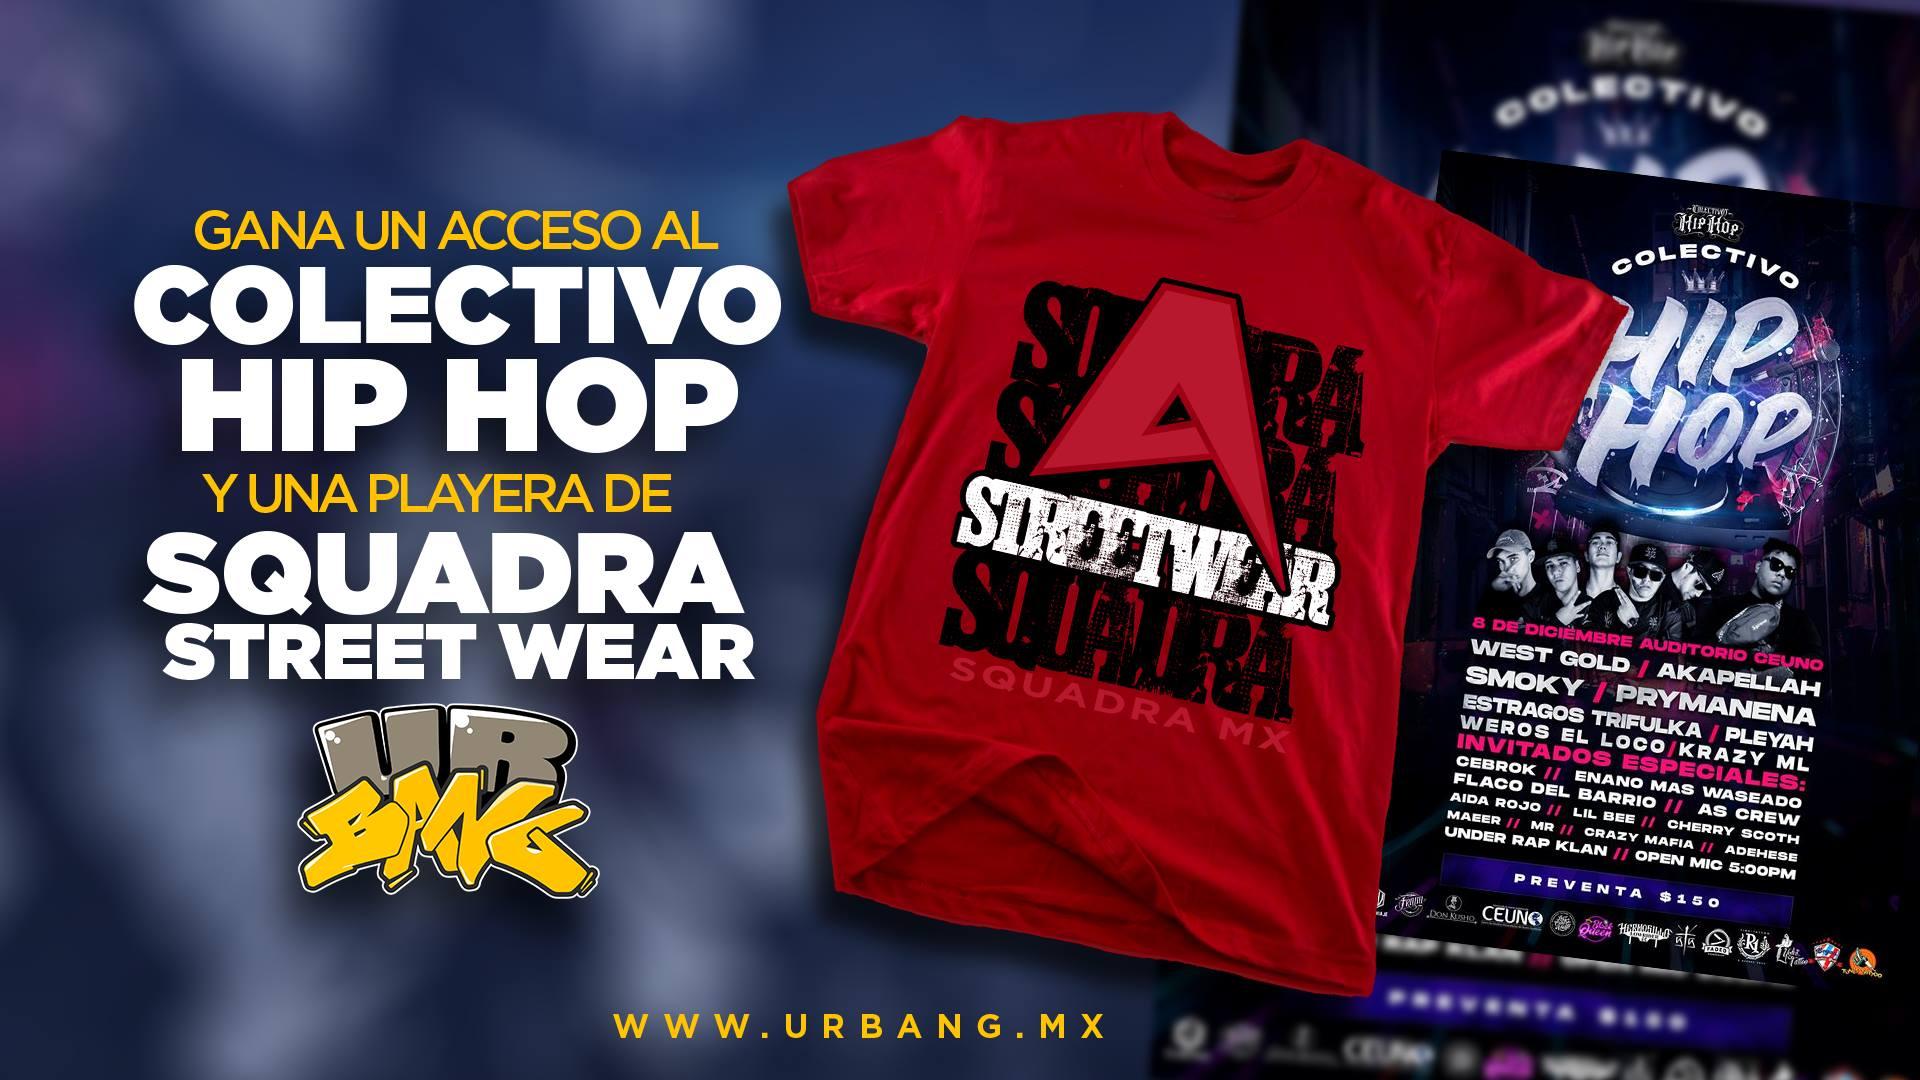 Colectivo Hip Hop: Gana un Acceso + Playera Squadra Street Wear